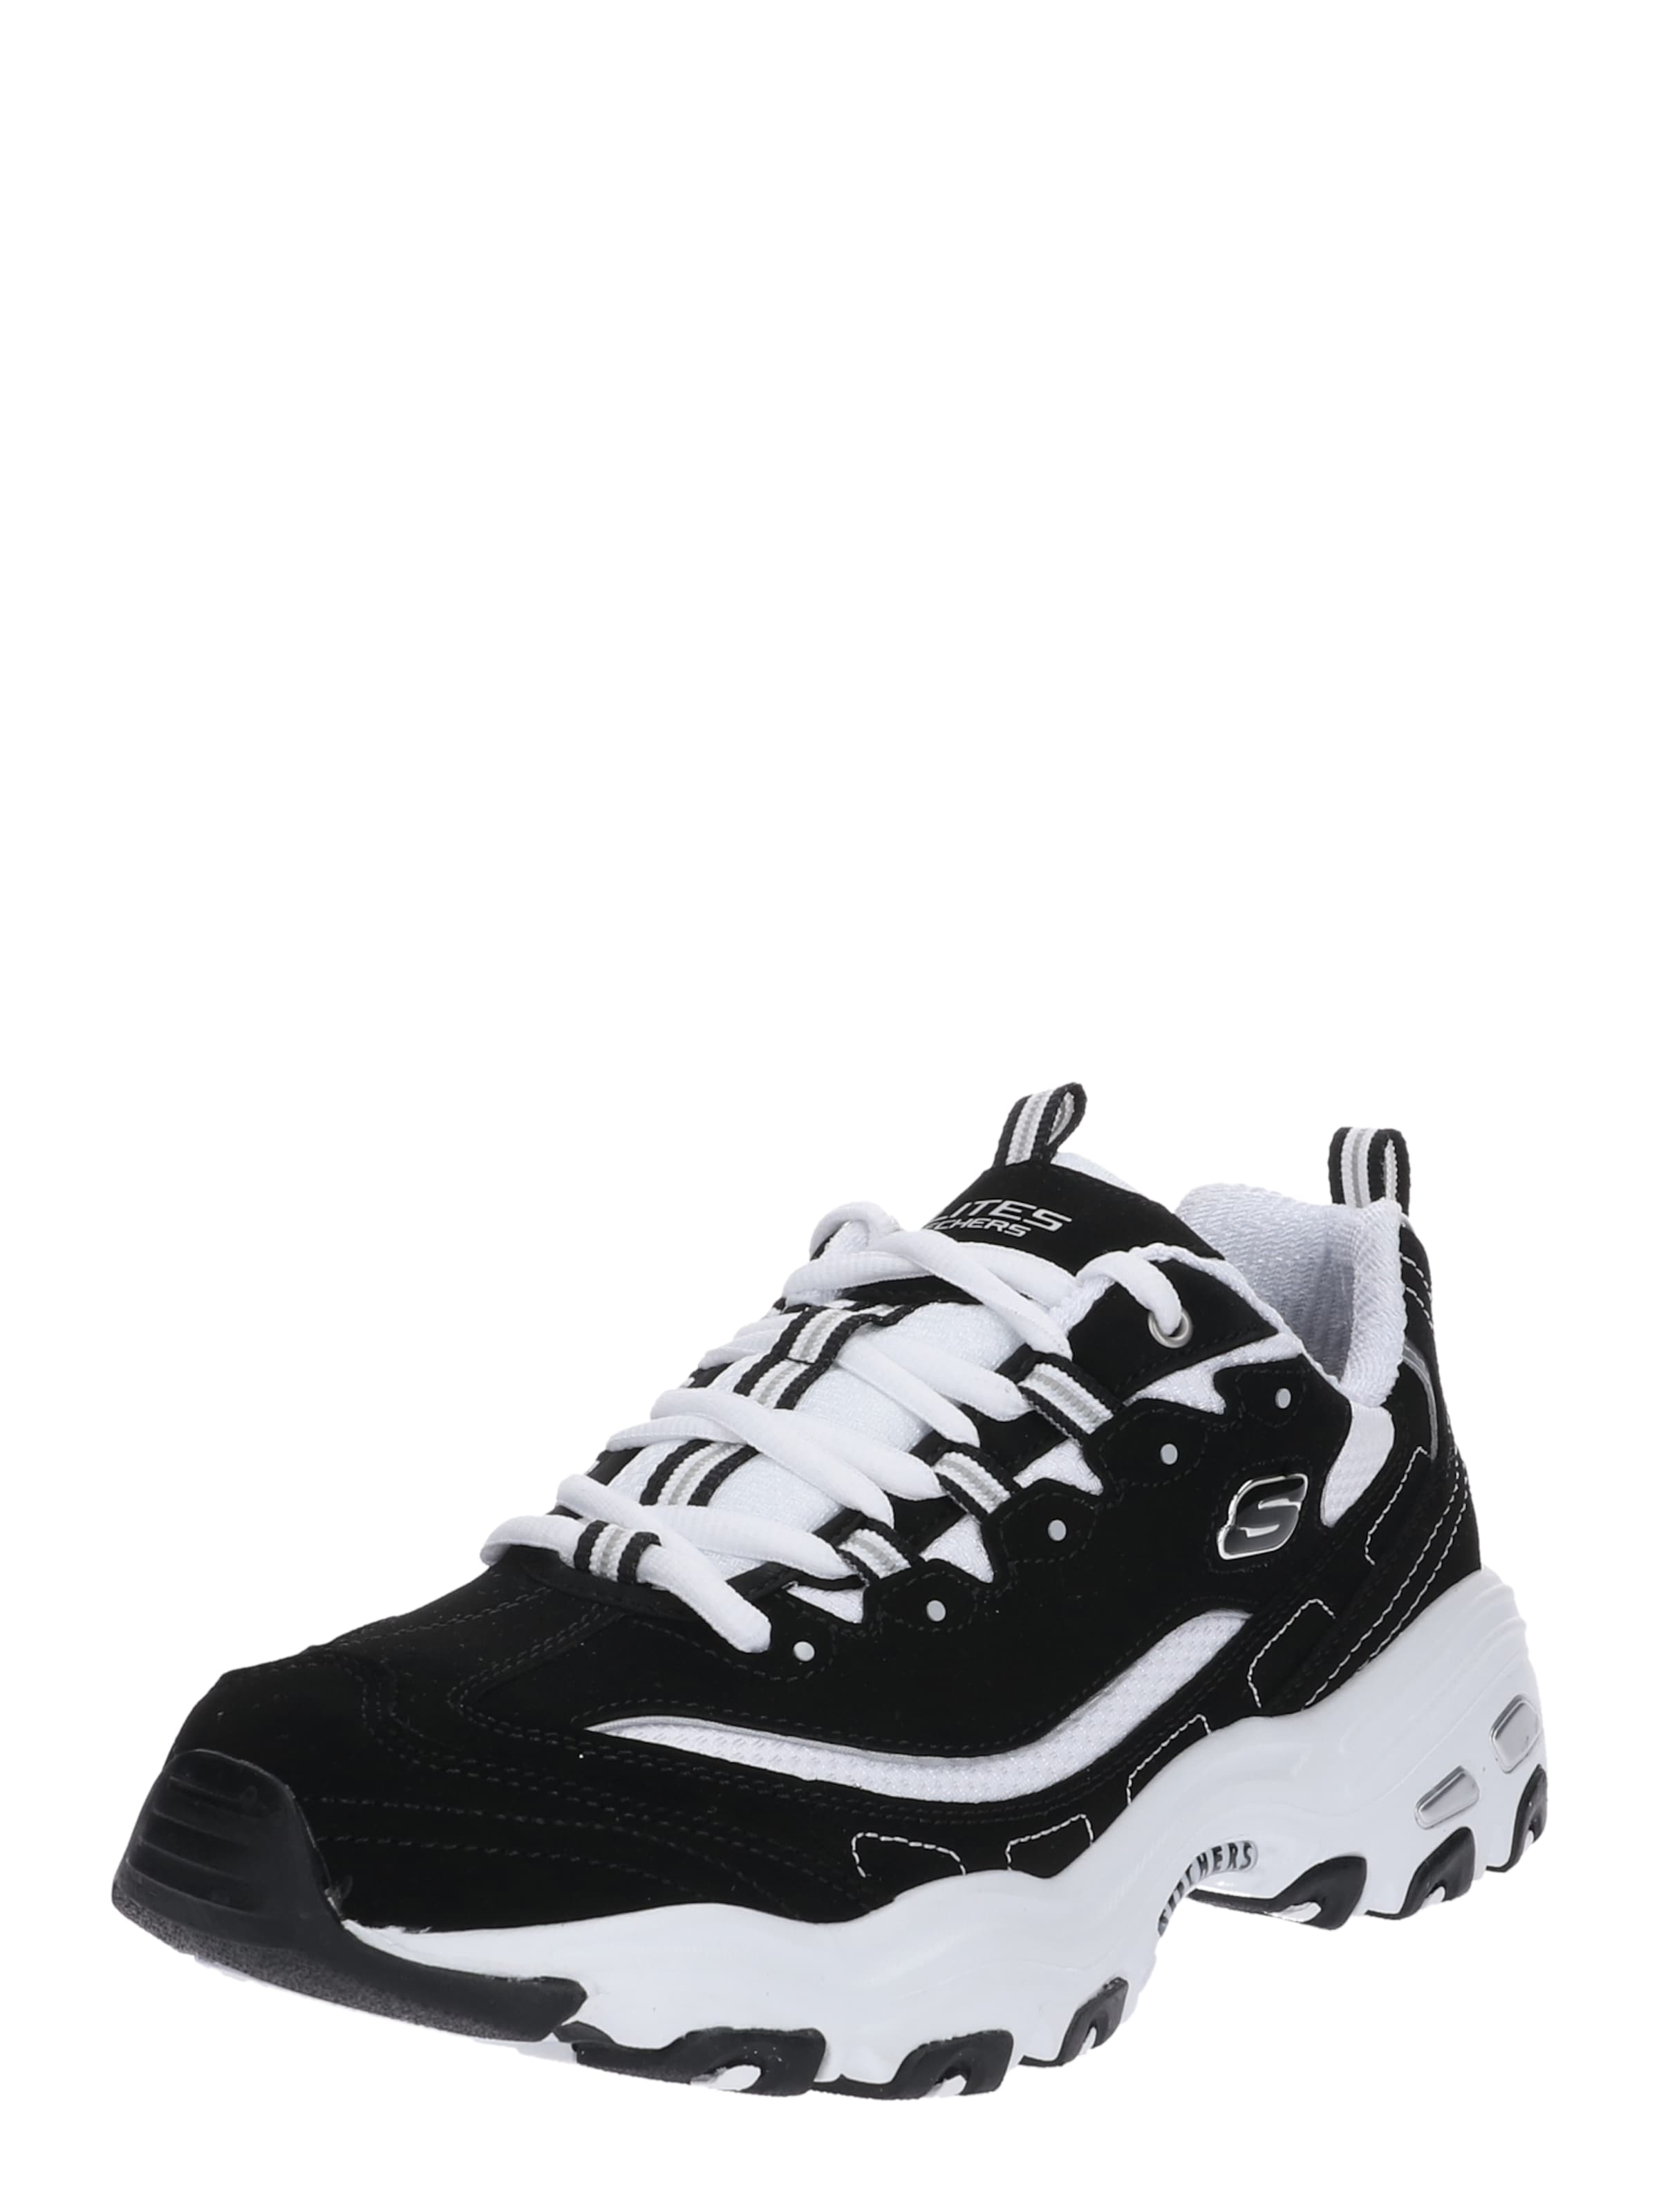 Sneaker In Skechers 'd'lites' SchwarzWeiß 'd'lites' SchwarzWeiß Sneaker Skechers In Skechers 6Y7Ibgvmfy